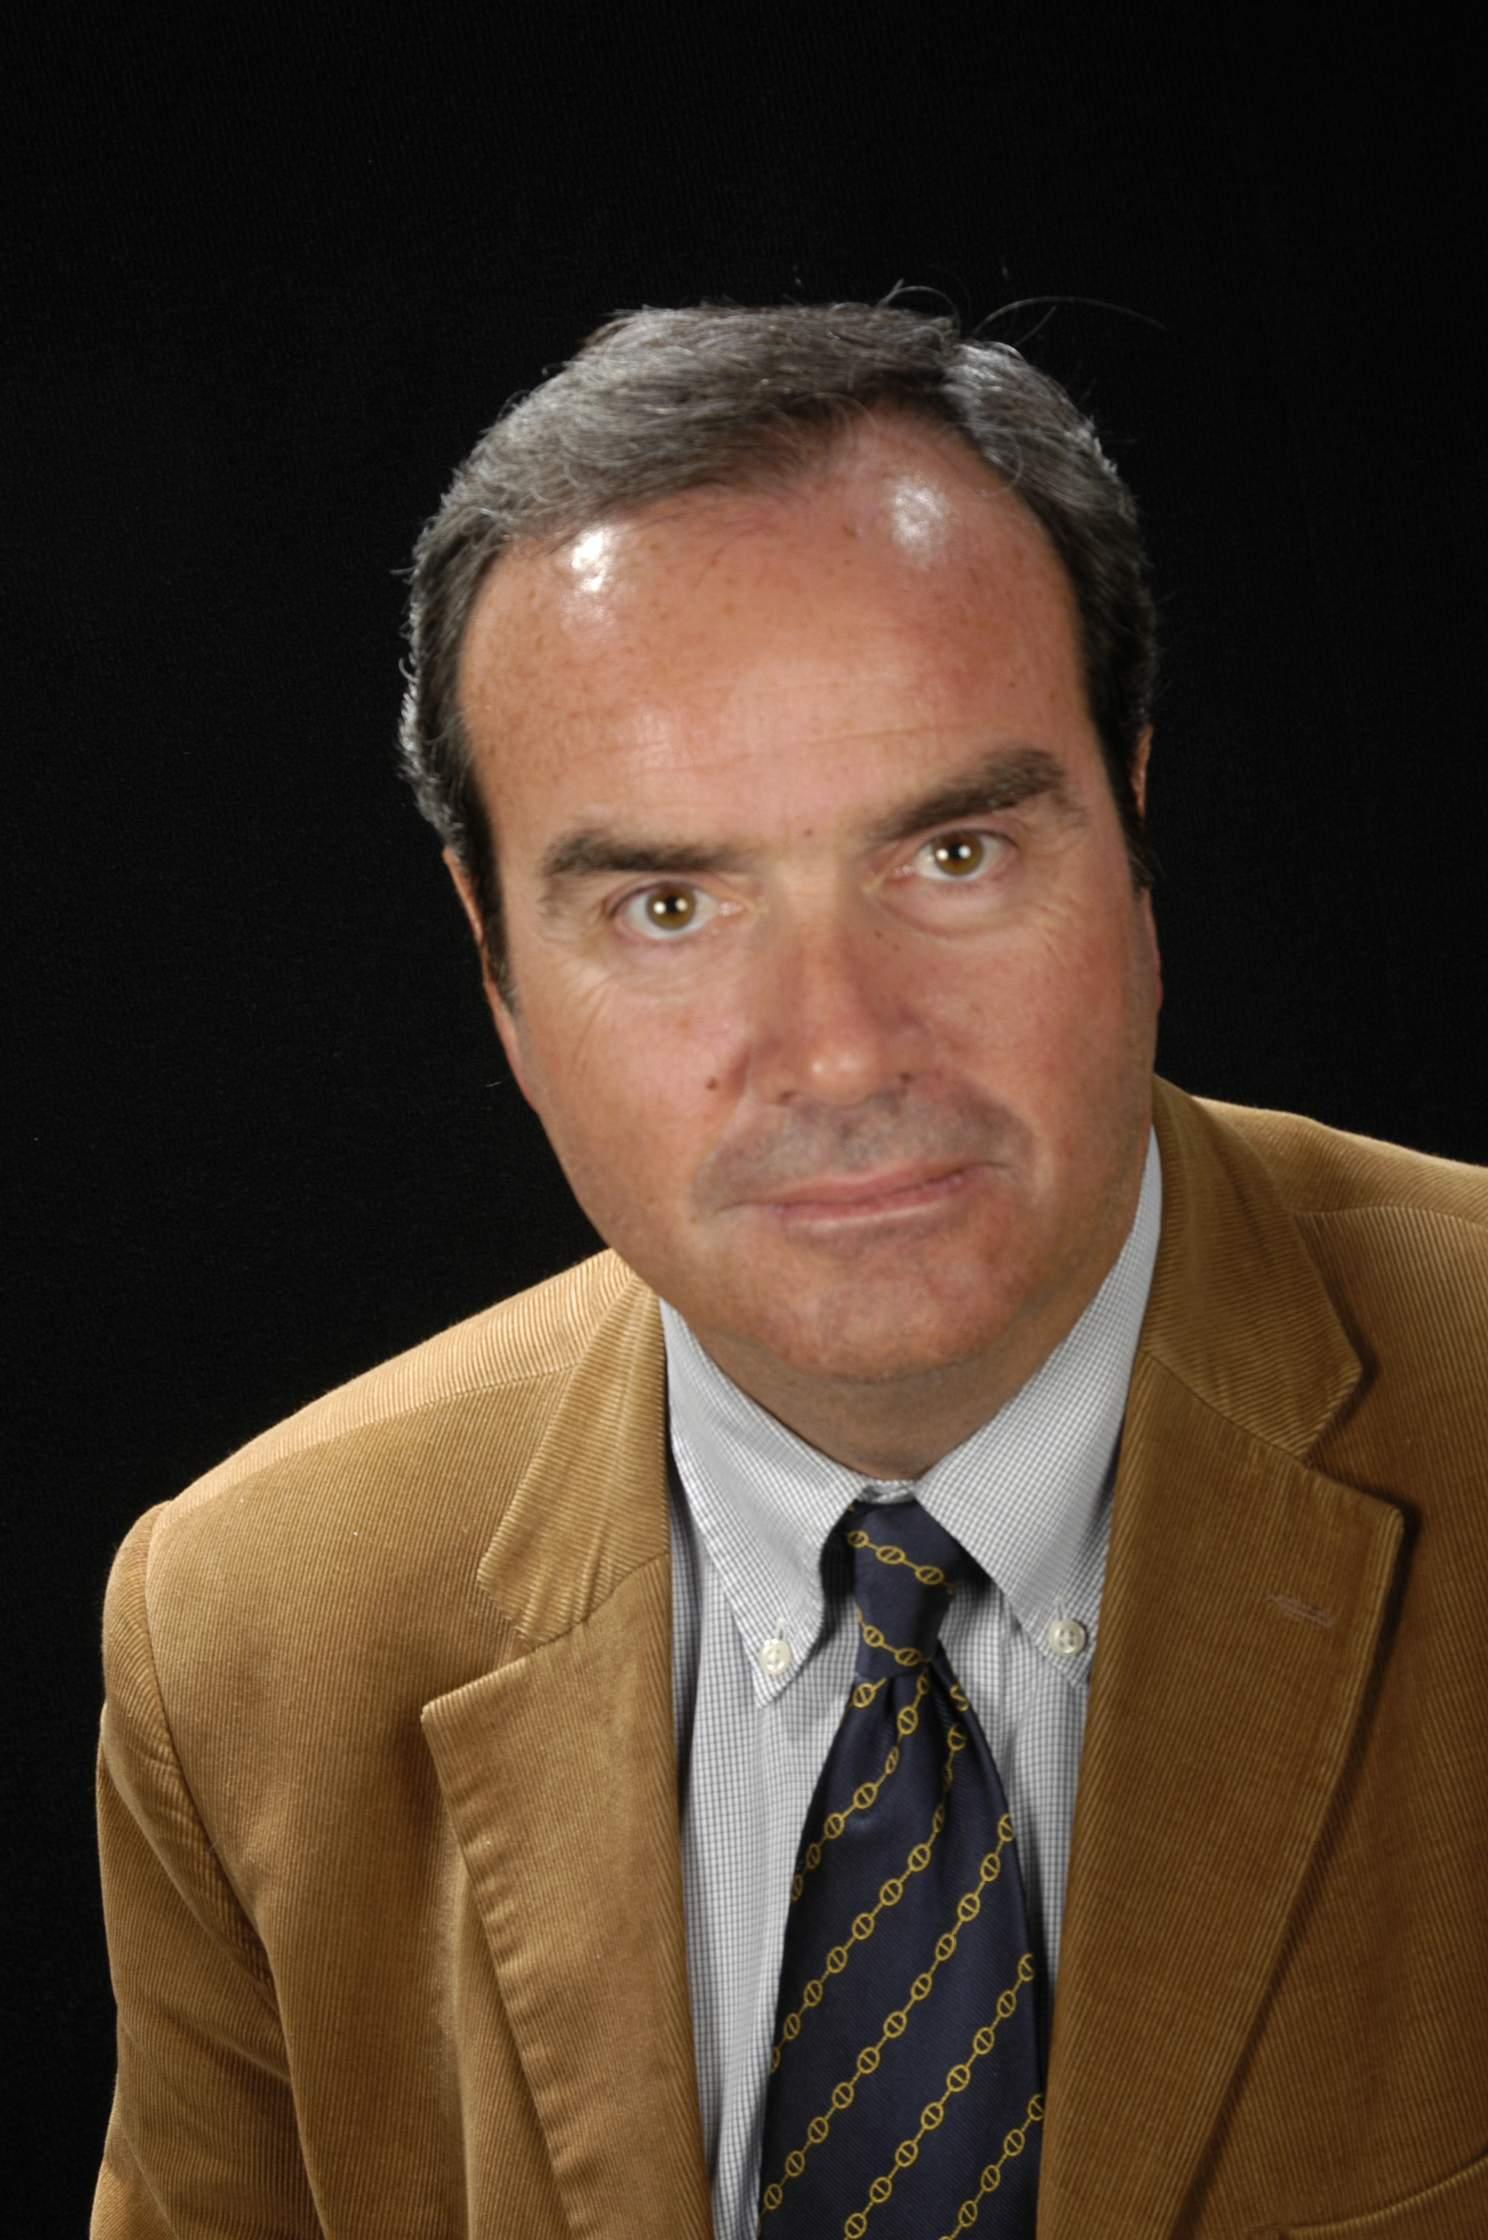 Josep Oriol Carreras